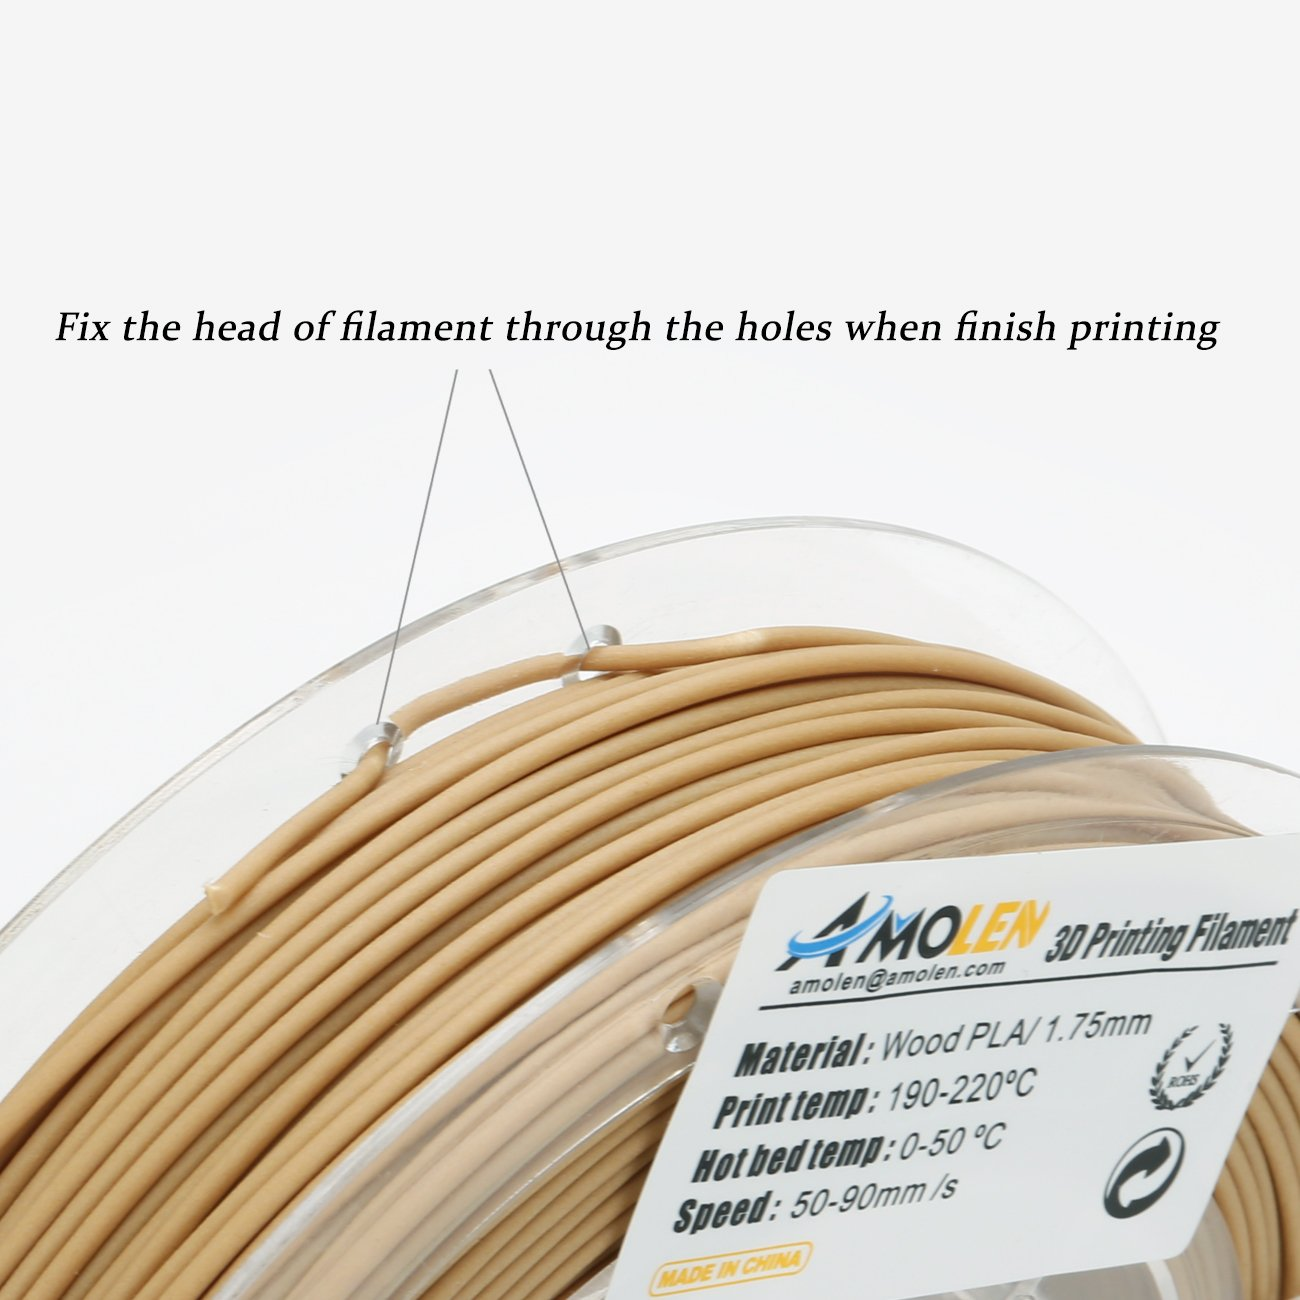 Shining Gold PLA Filament 1.75mm +//- 0.03 mm AMOLEN 3D Printer Filament Set Marble Bronze Includes Sample UV Color Change to Hot Pink and GITD Blue Filament. Wood 4x225g